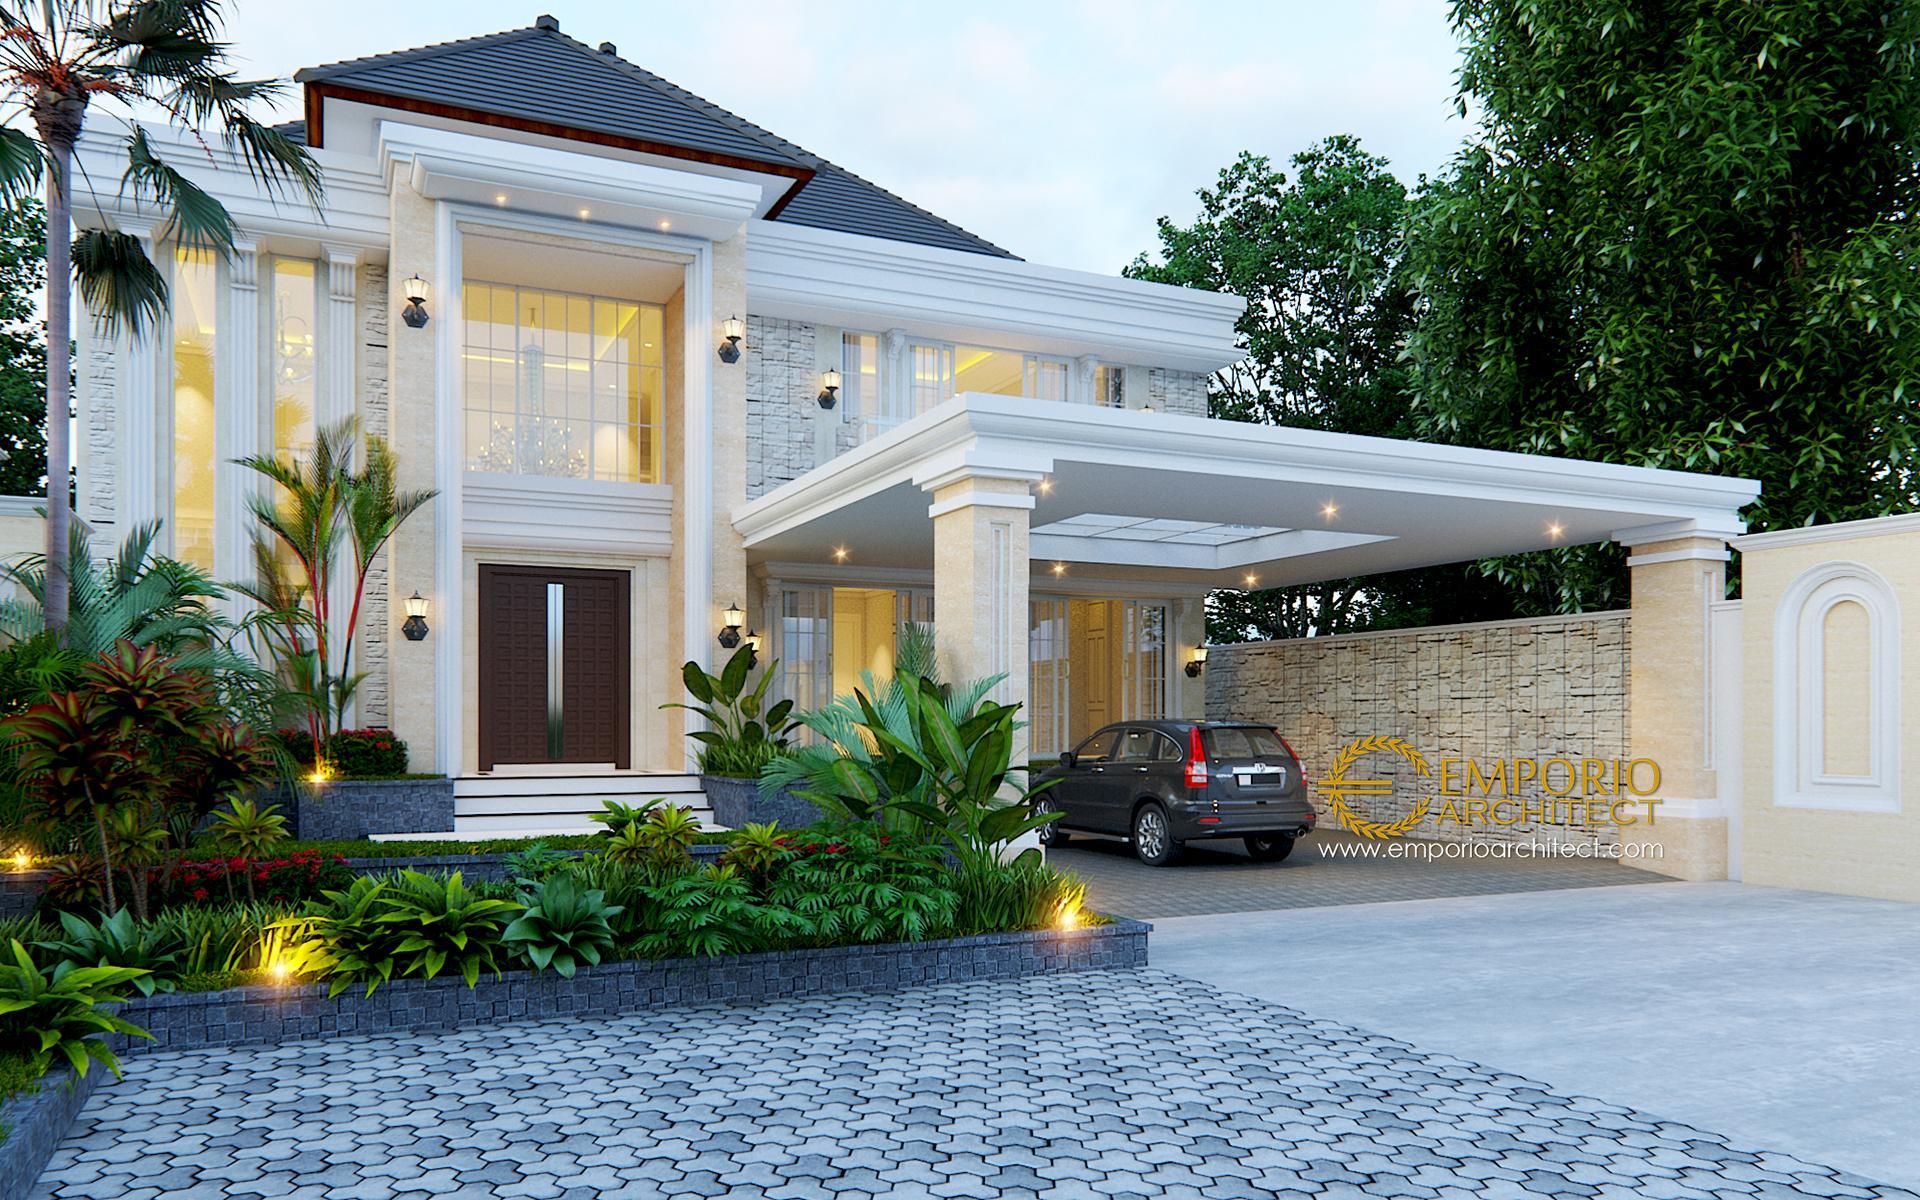 Desain Rumah Classic 2 Lantai Bapak Gatot Di Yogyakarta